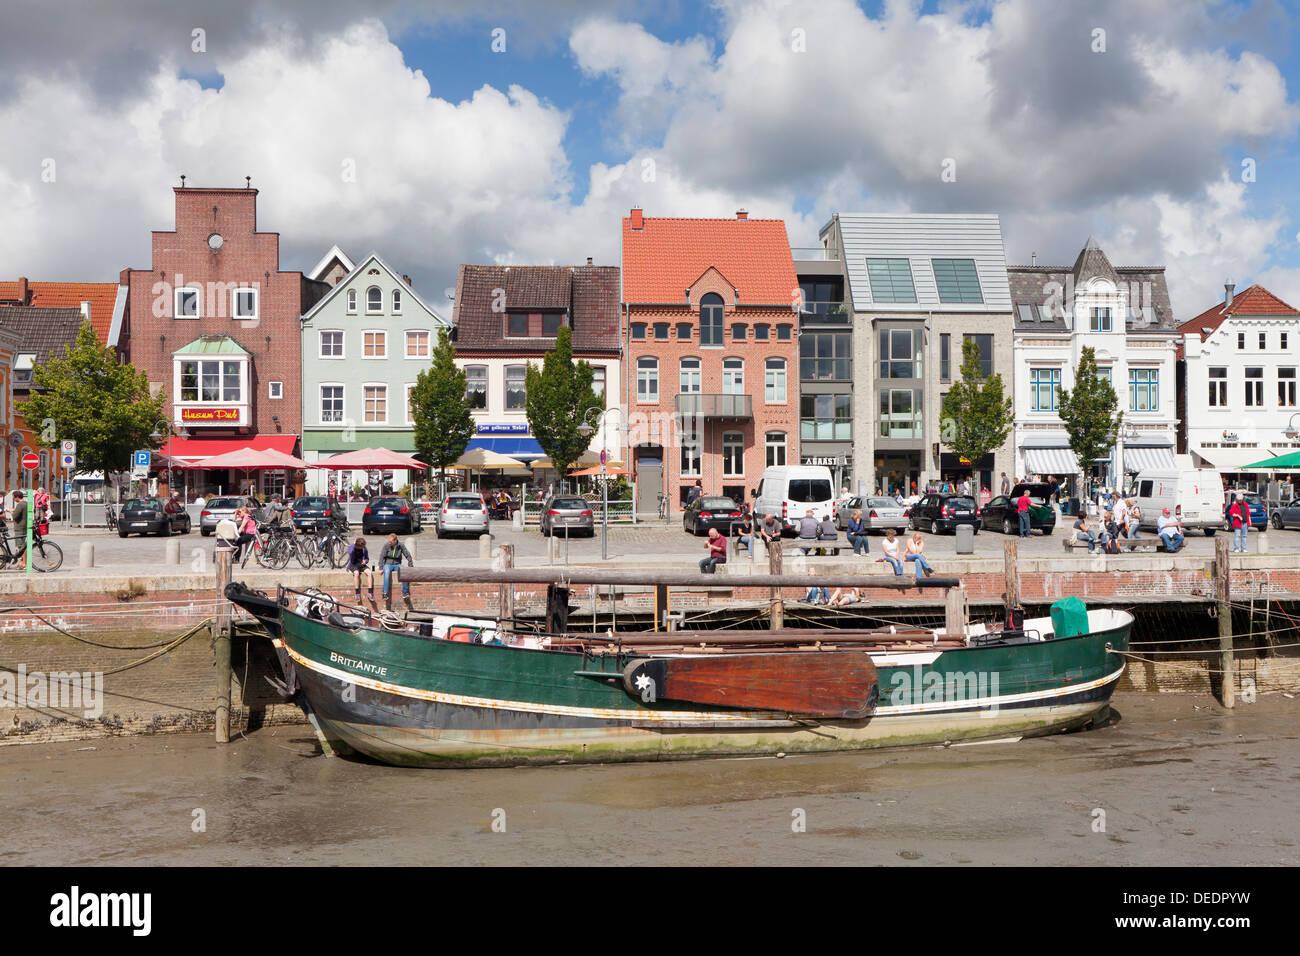 Ship at low tide, Husum, Nordfriesland, Schleswig Holstein, Germany, Europe - Stock Image